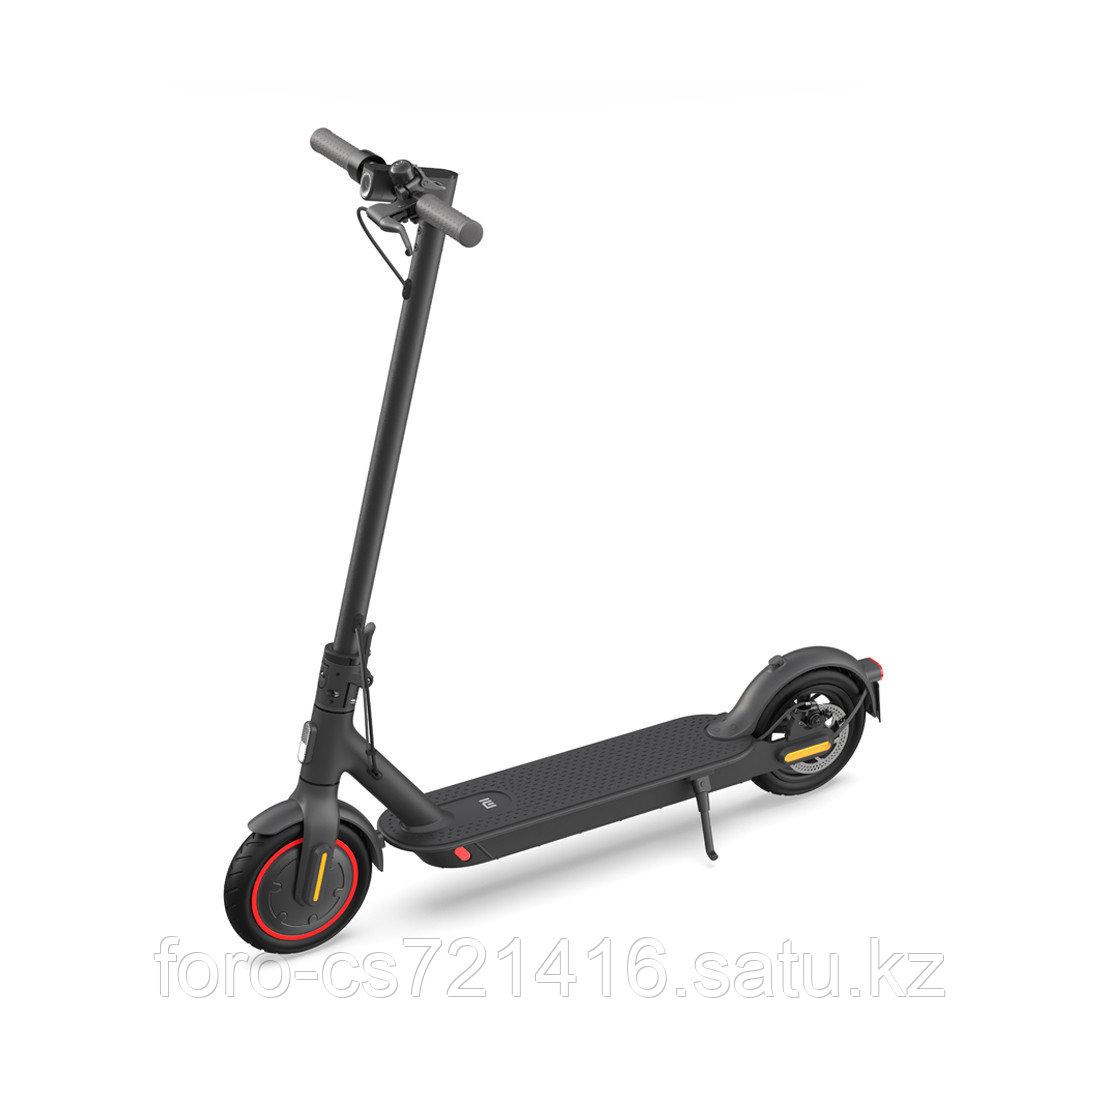 Электросамокат Xiaomi MiJia Smart Electric Scooter Pro 2 - фото 1